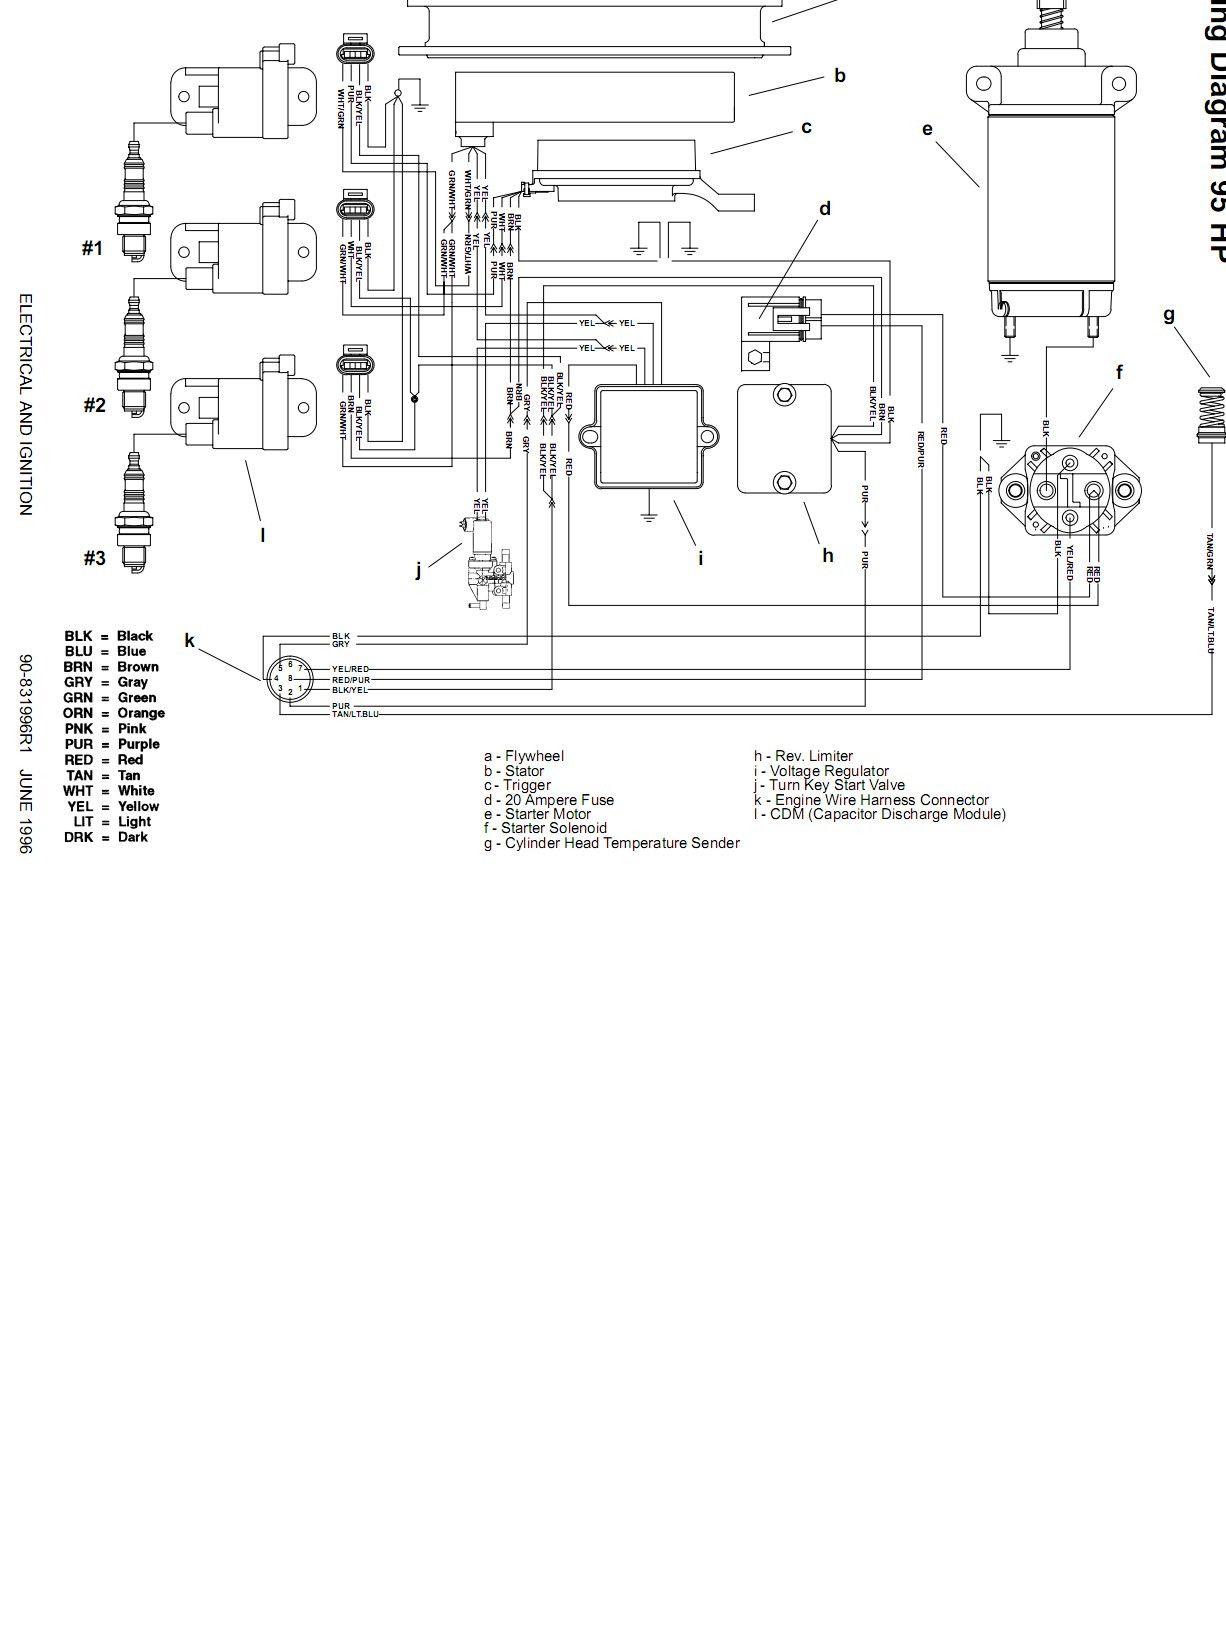 50 Wiring Diagram for Mercury Outboard Motor Yc0r di 2020